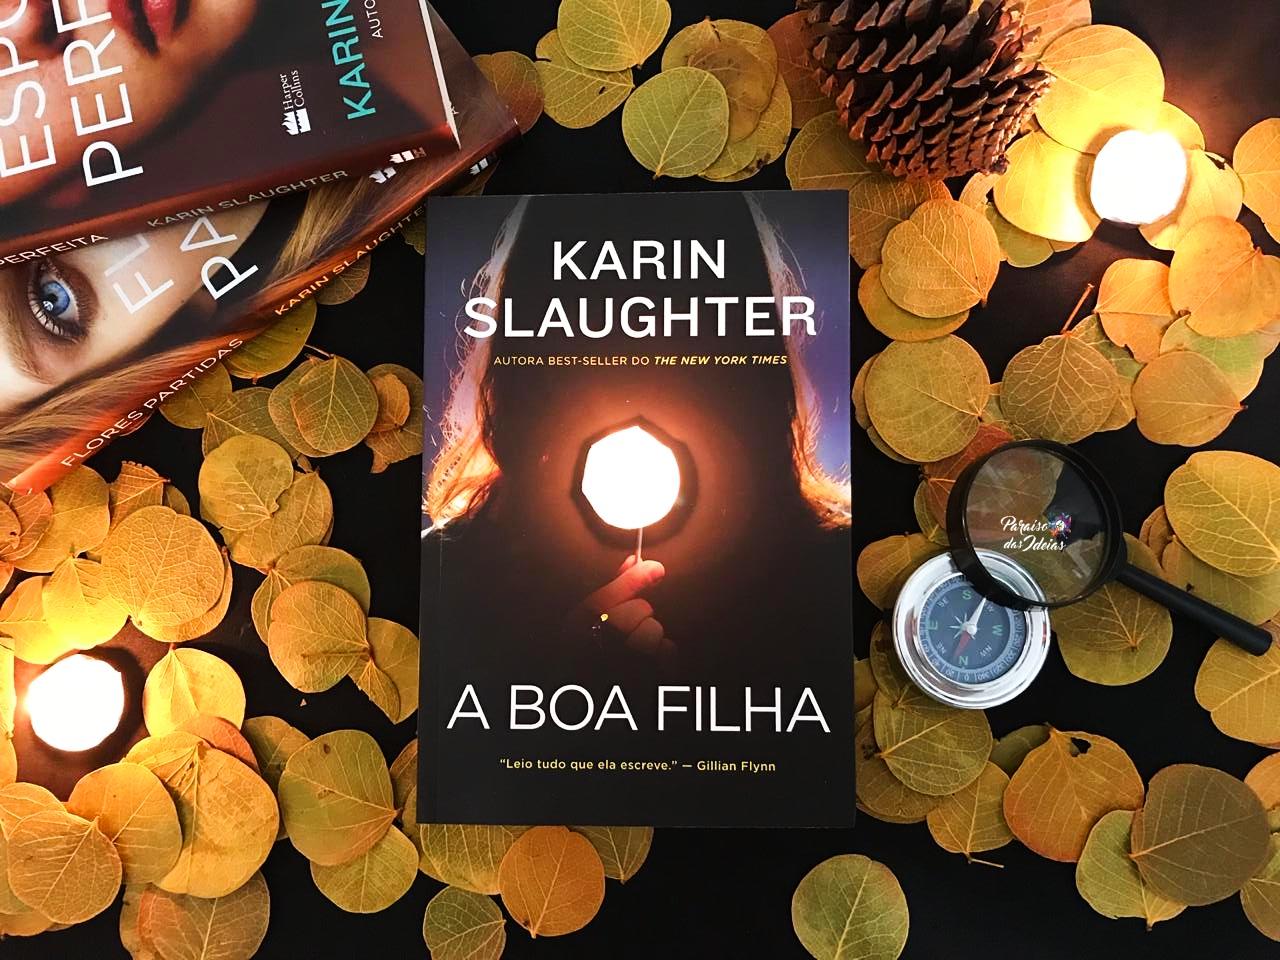 [Resenha] A Boa Filha - Karin Slaugther